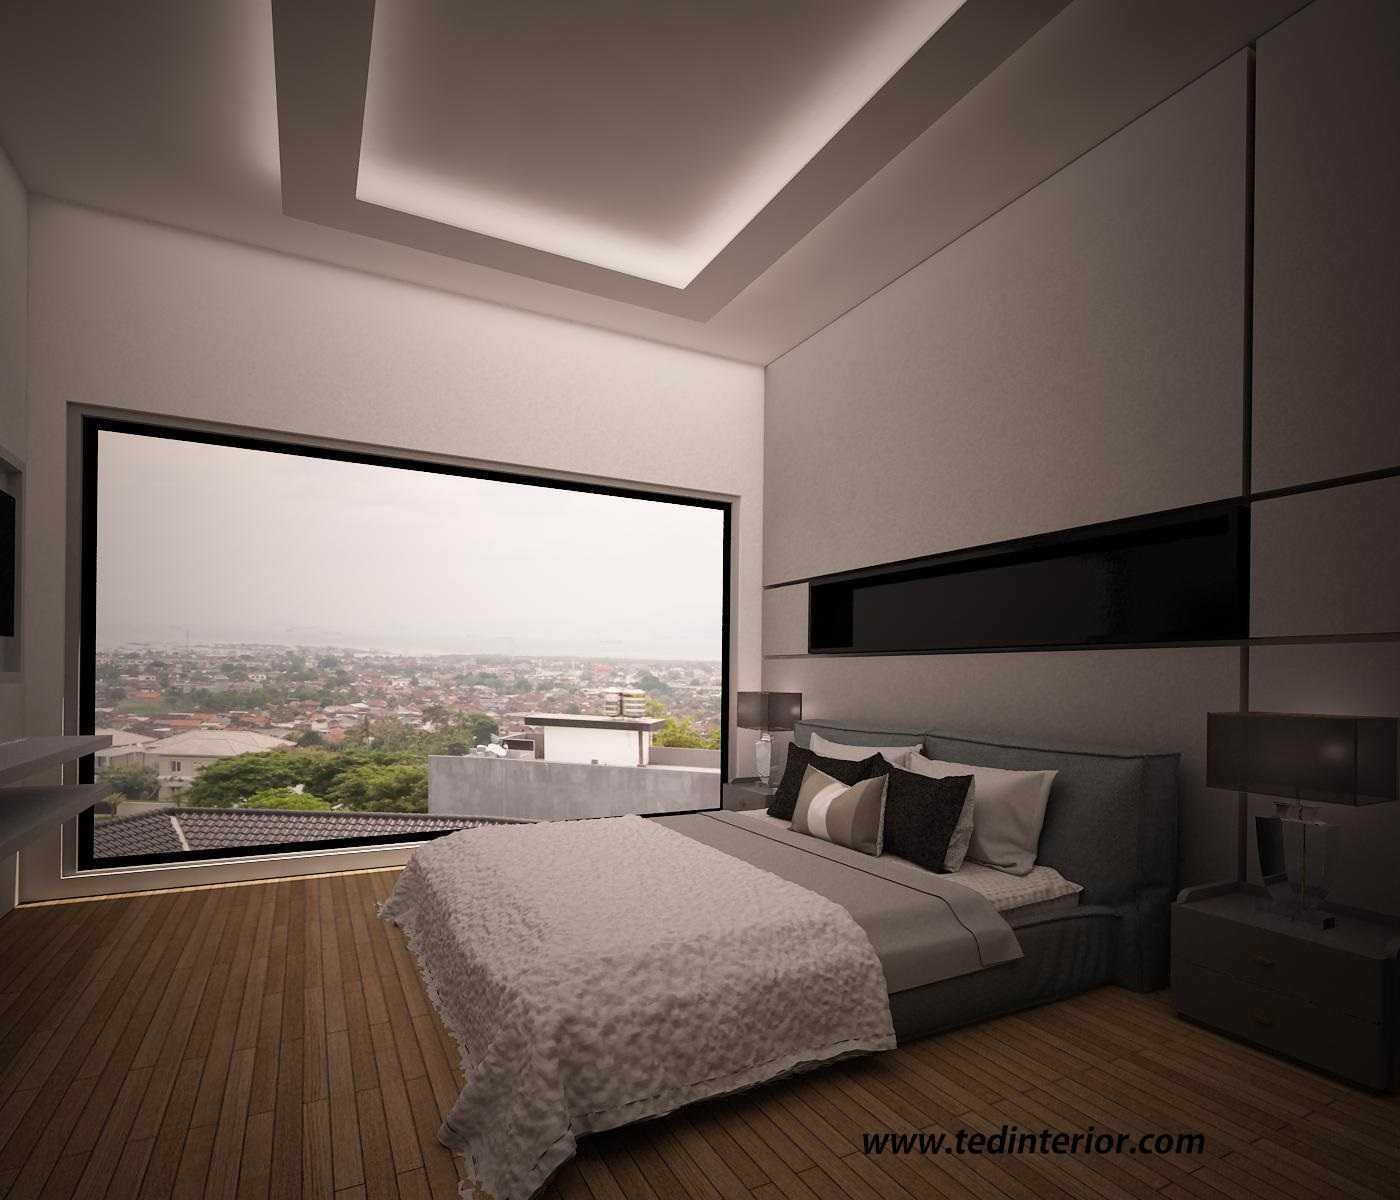 Pd Teguh Desain Indonesia Cluster Kenari Bukit Golf Mediterania Jakarta, Indonesia Jakarta, Indonesia Master-Bedroom-V1 Modern 35360